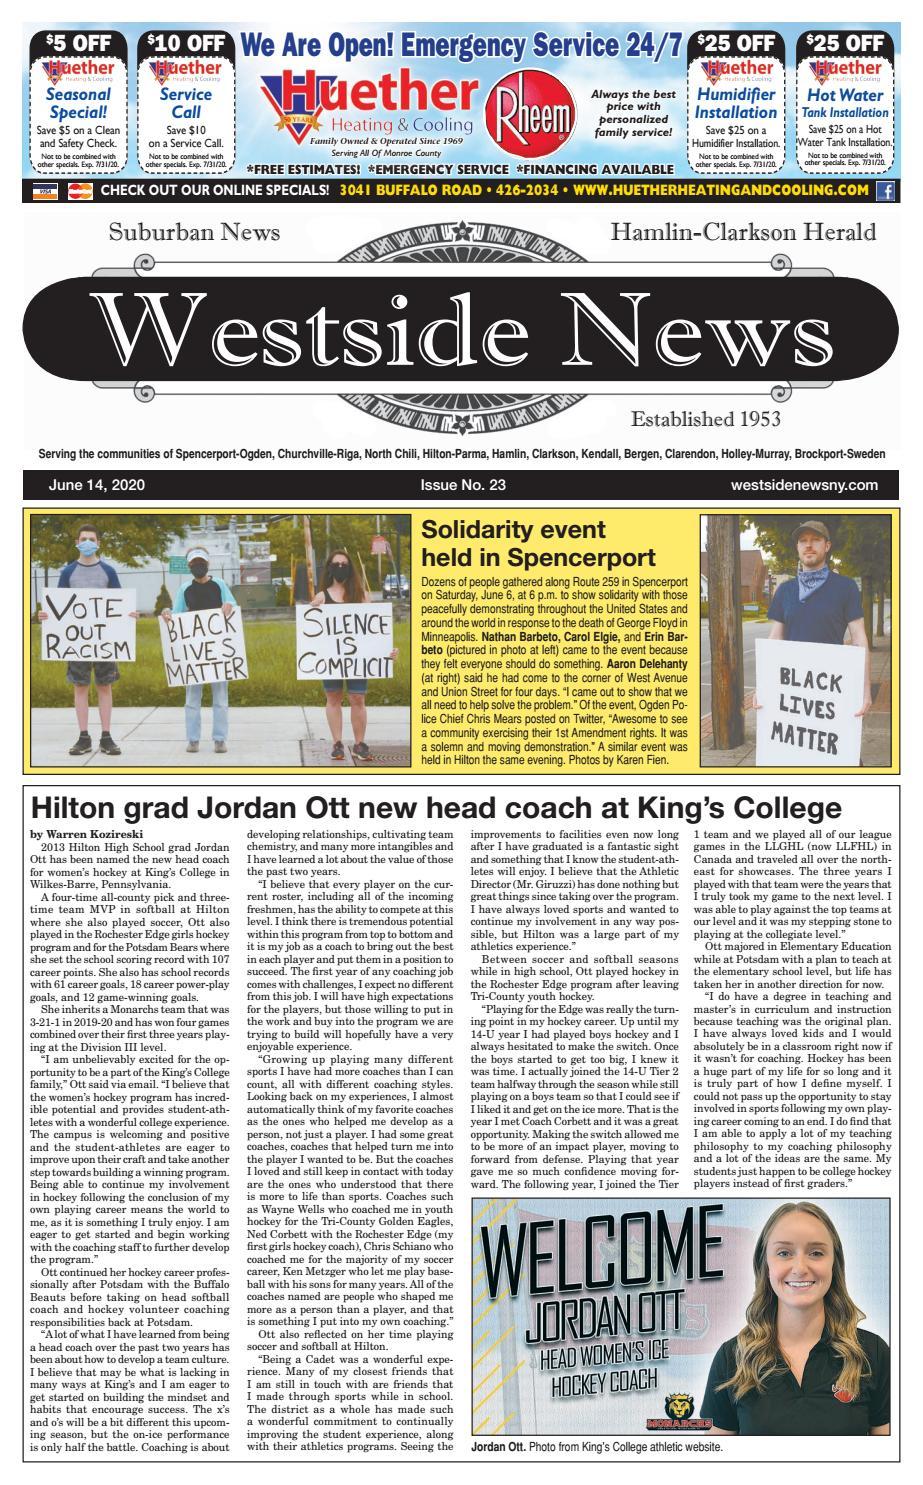 Westside News June 14 2020 By Westside News Inc Issuu